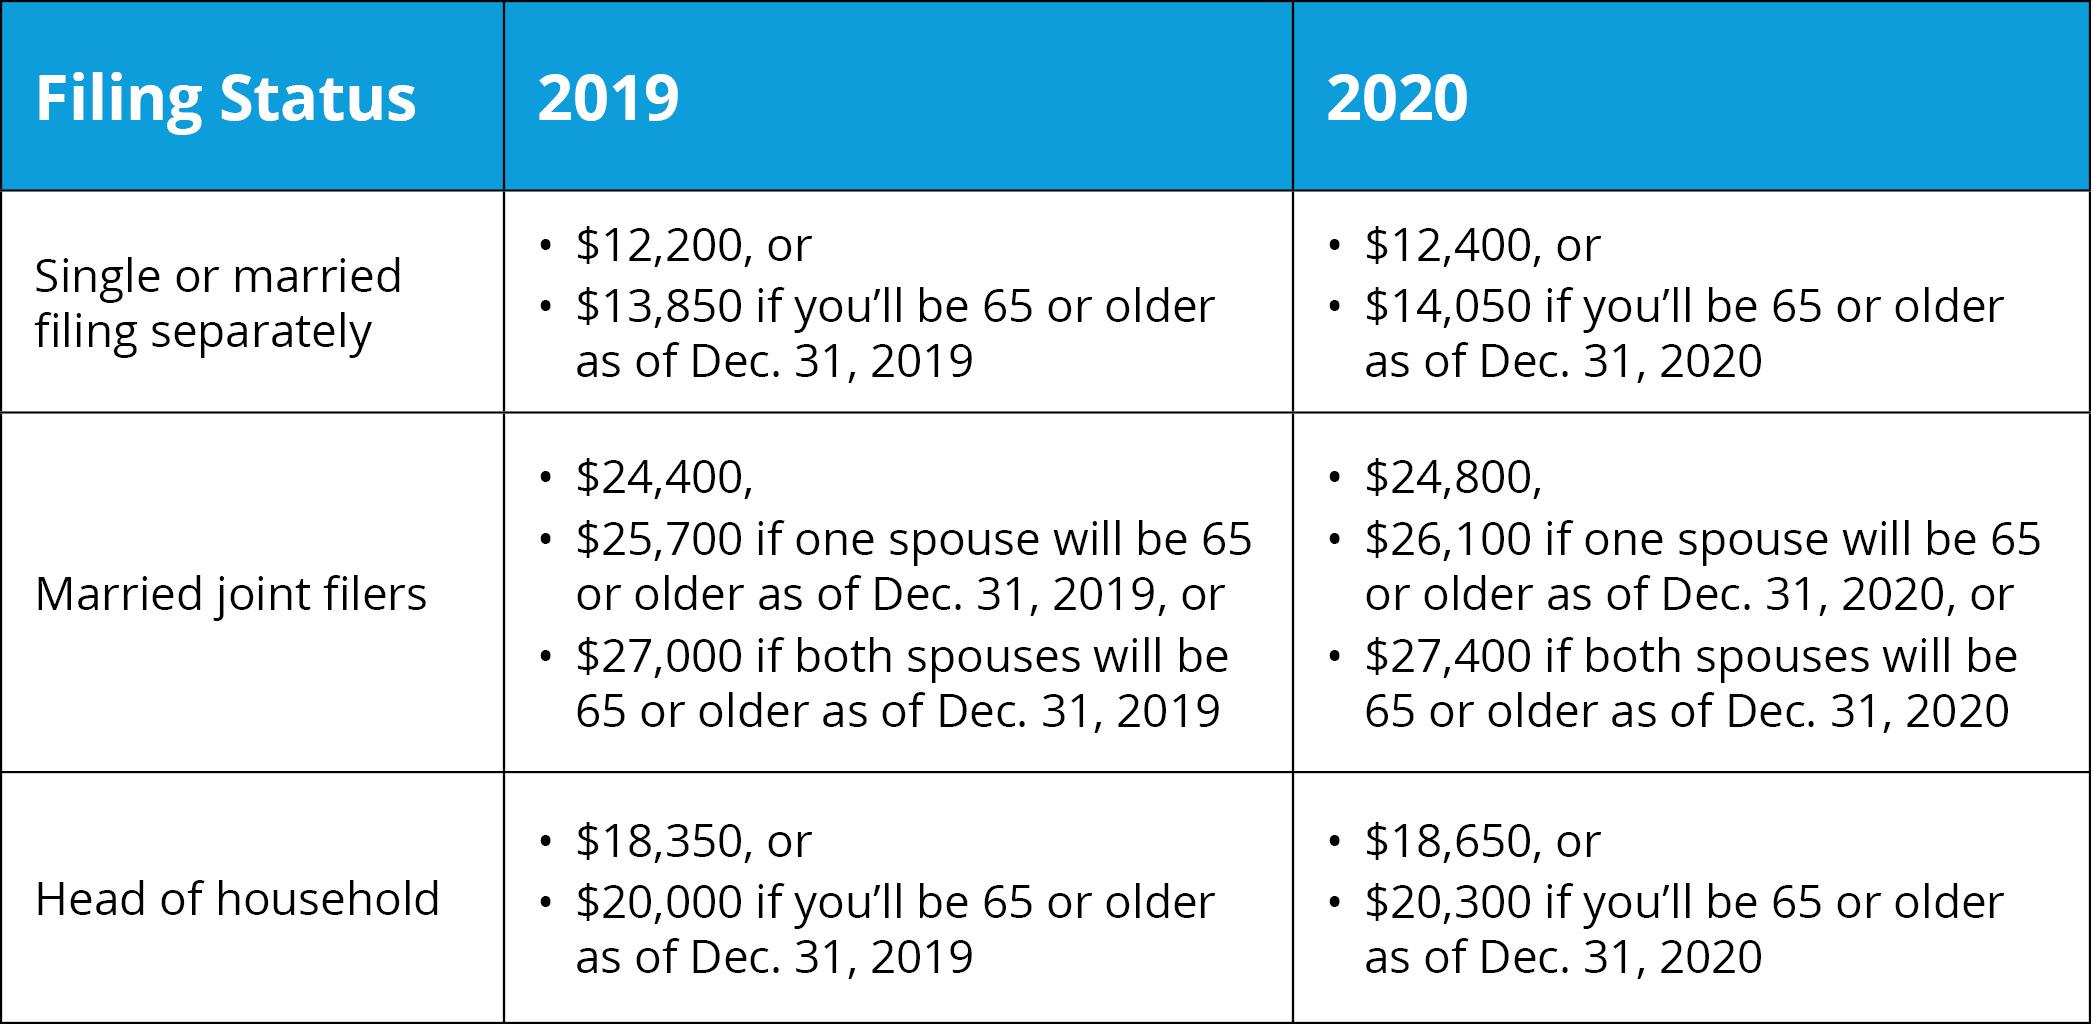 2019 & 2020 Standard Deduction Amounts